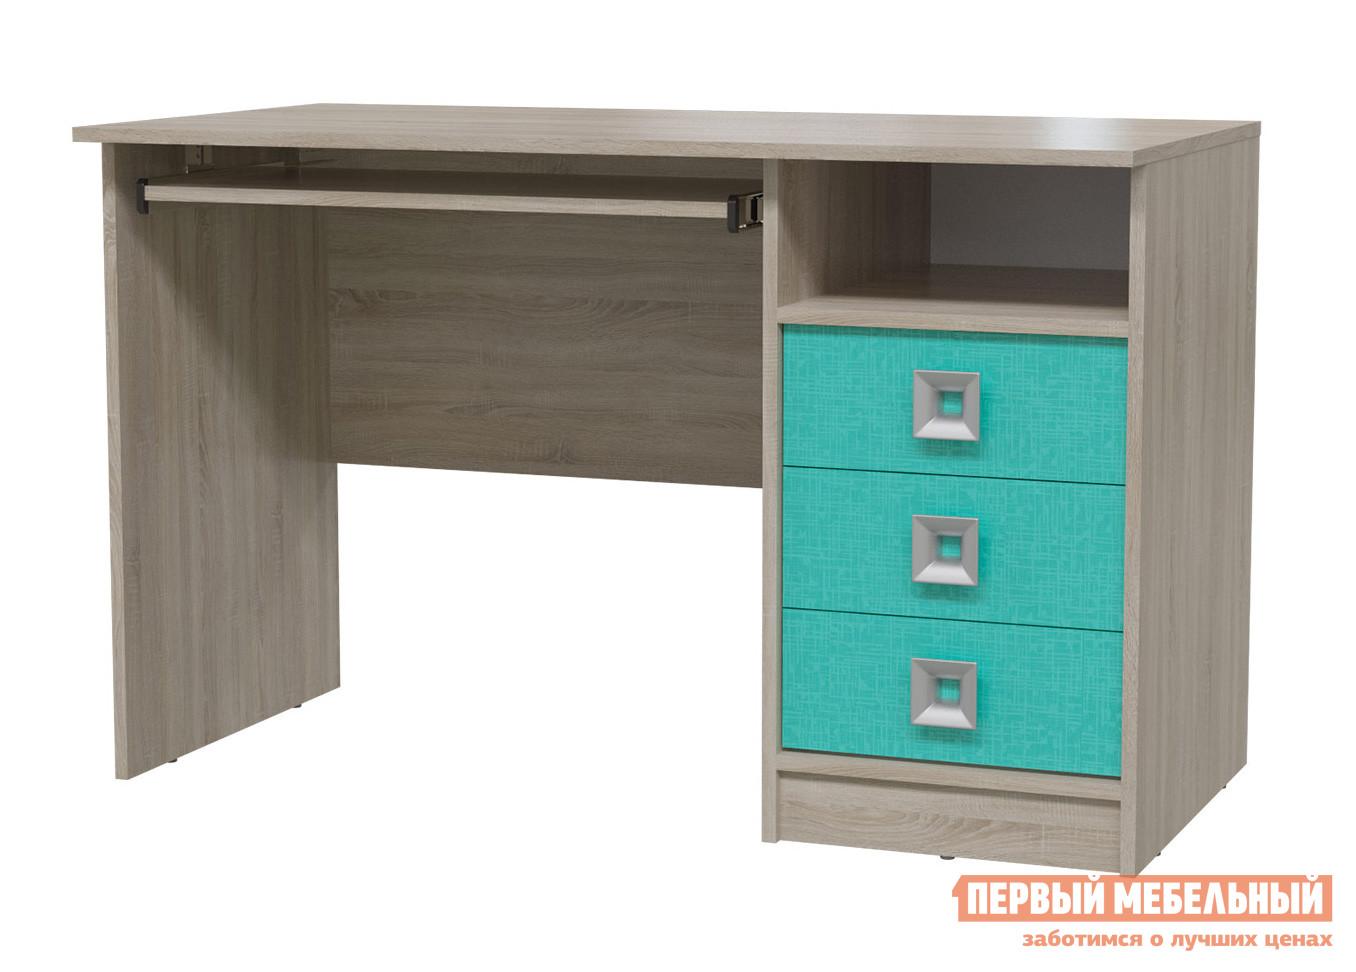 Компьютерный стол Бит и Байт 6-0601